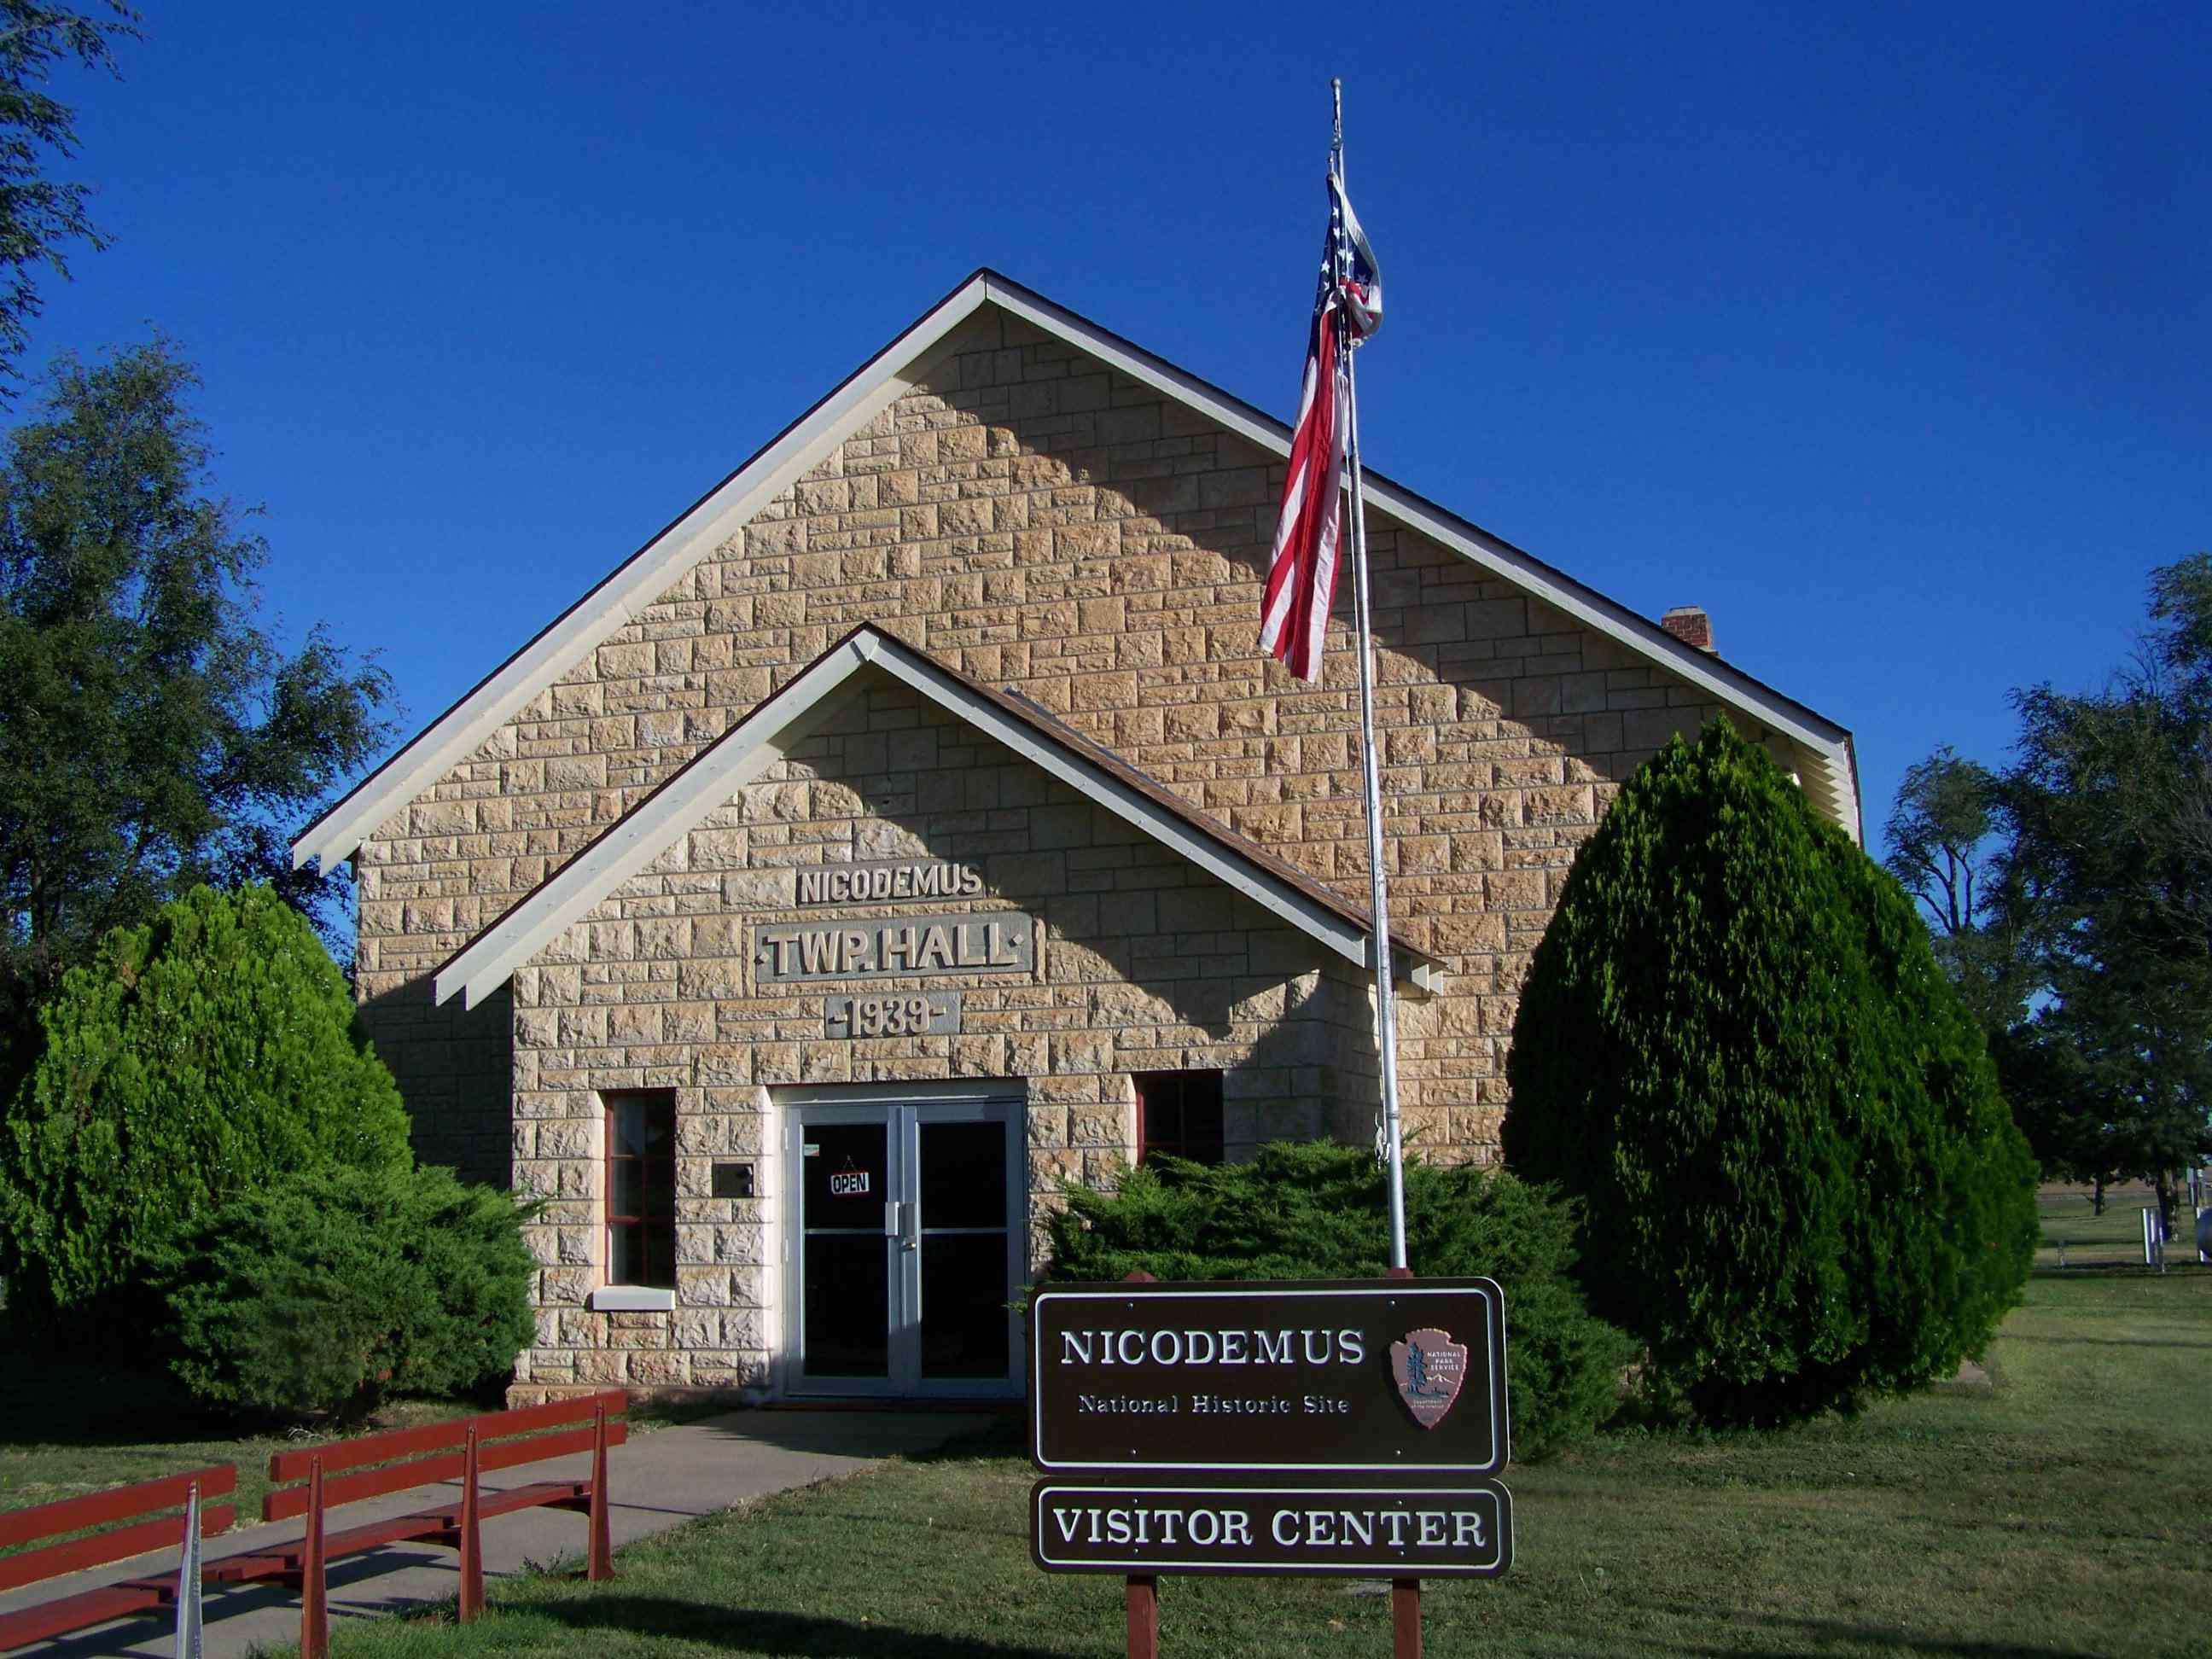 Stone Visitor Center in Nicodemus National Historic Site, Graham County, Kansas